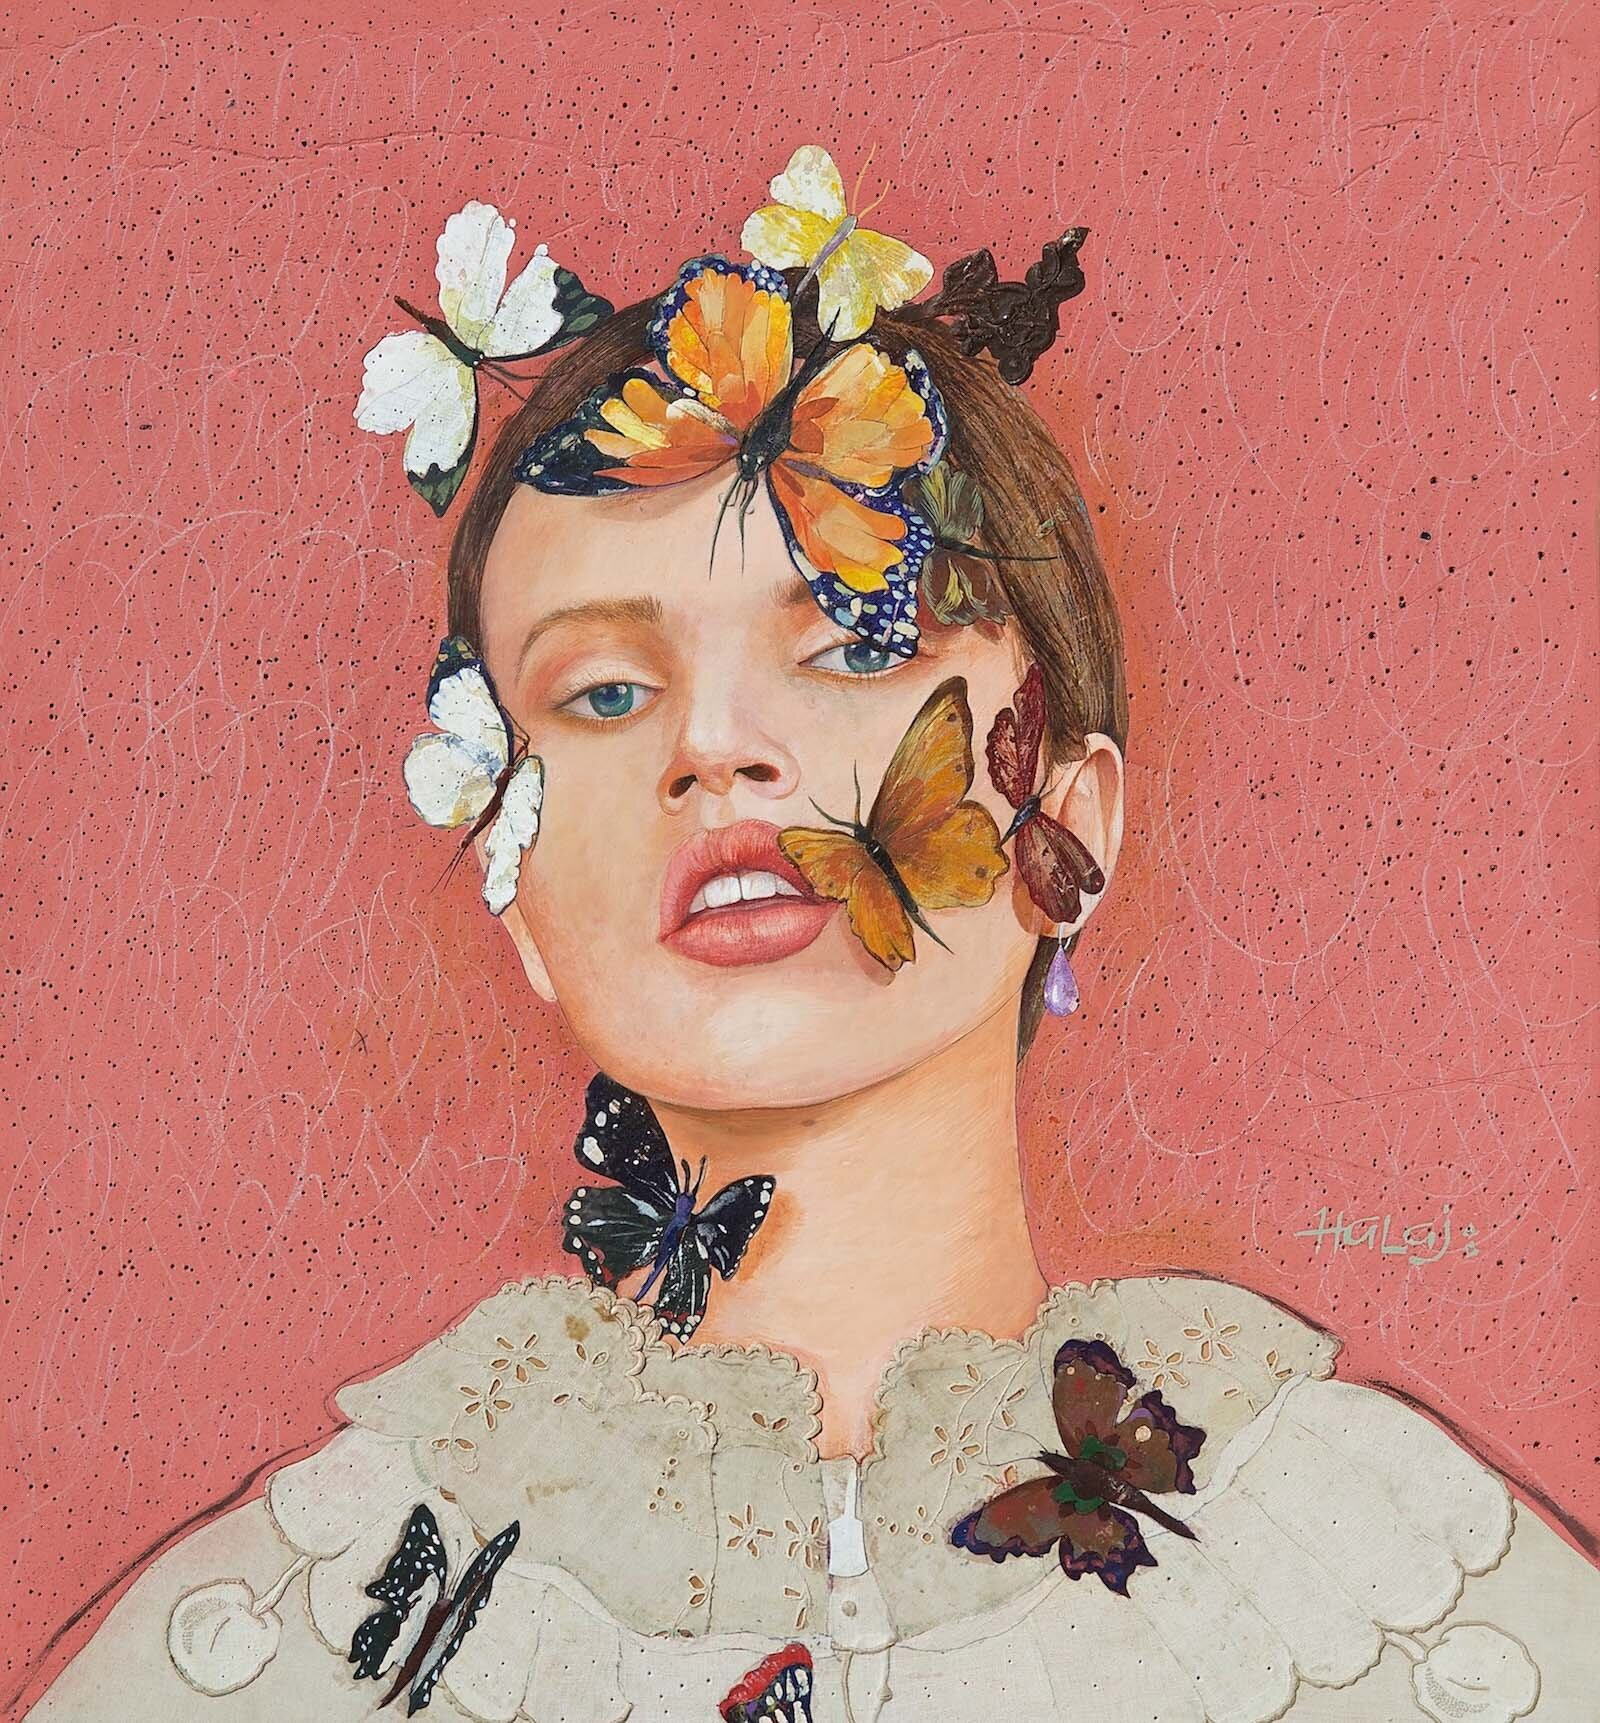 Minas Halaj %22 Butterfly #1 %22 2018, Oil, Mixed Media On Panel, 28x26 inches, (71.12 x 66.04 cm. ).jpg